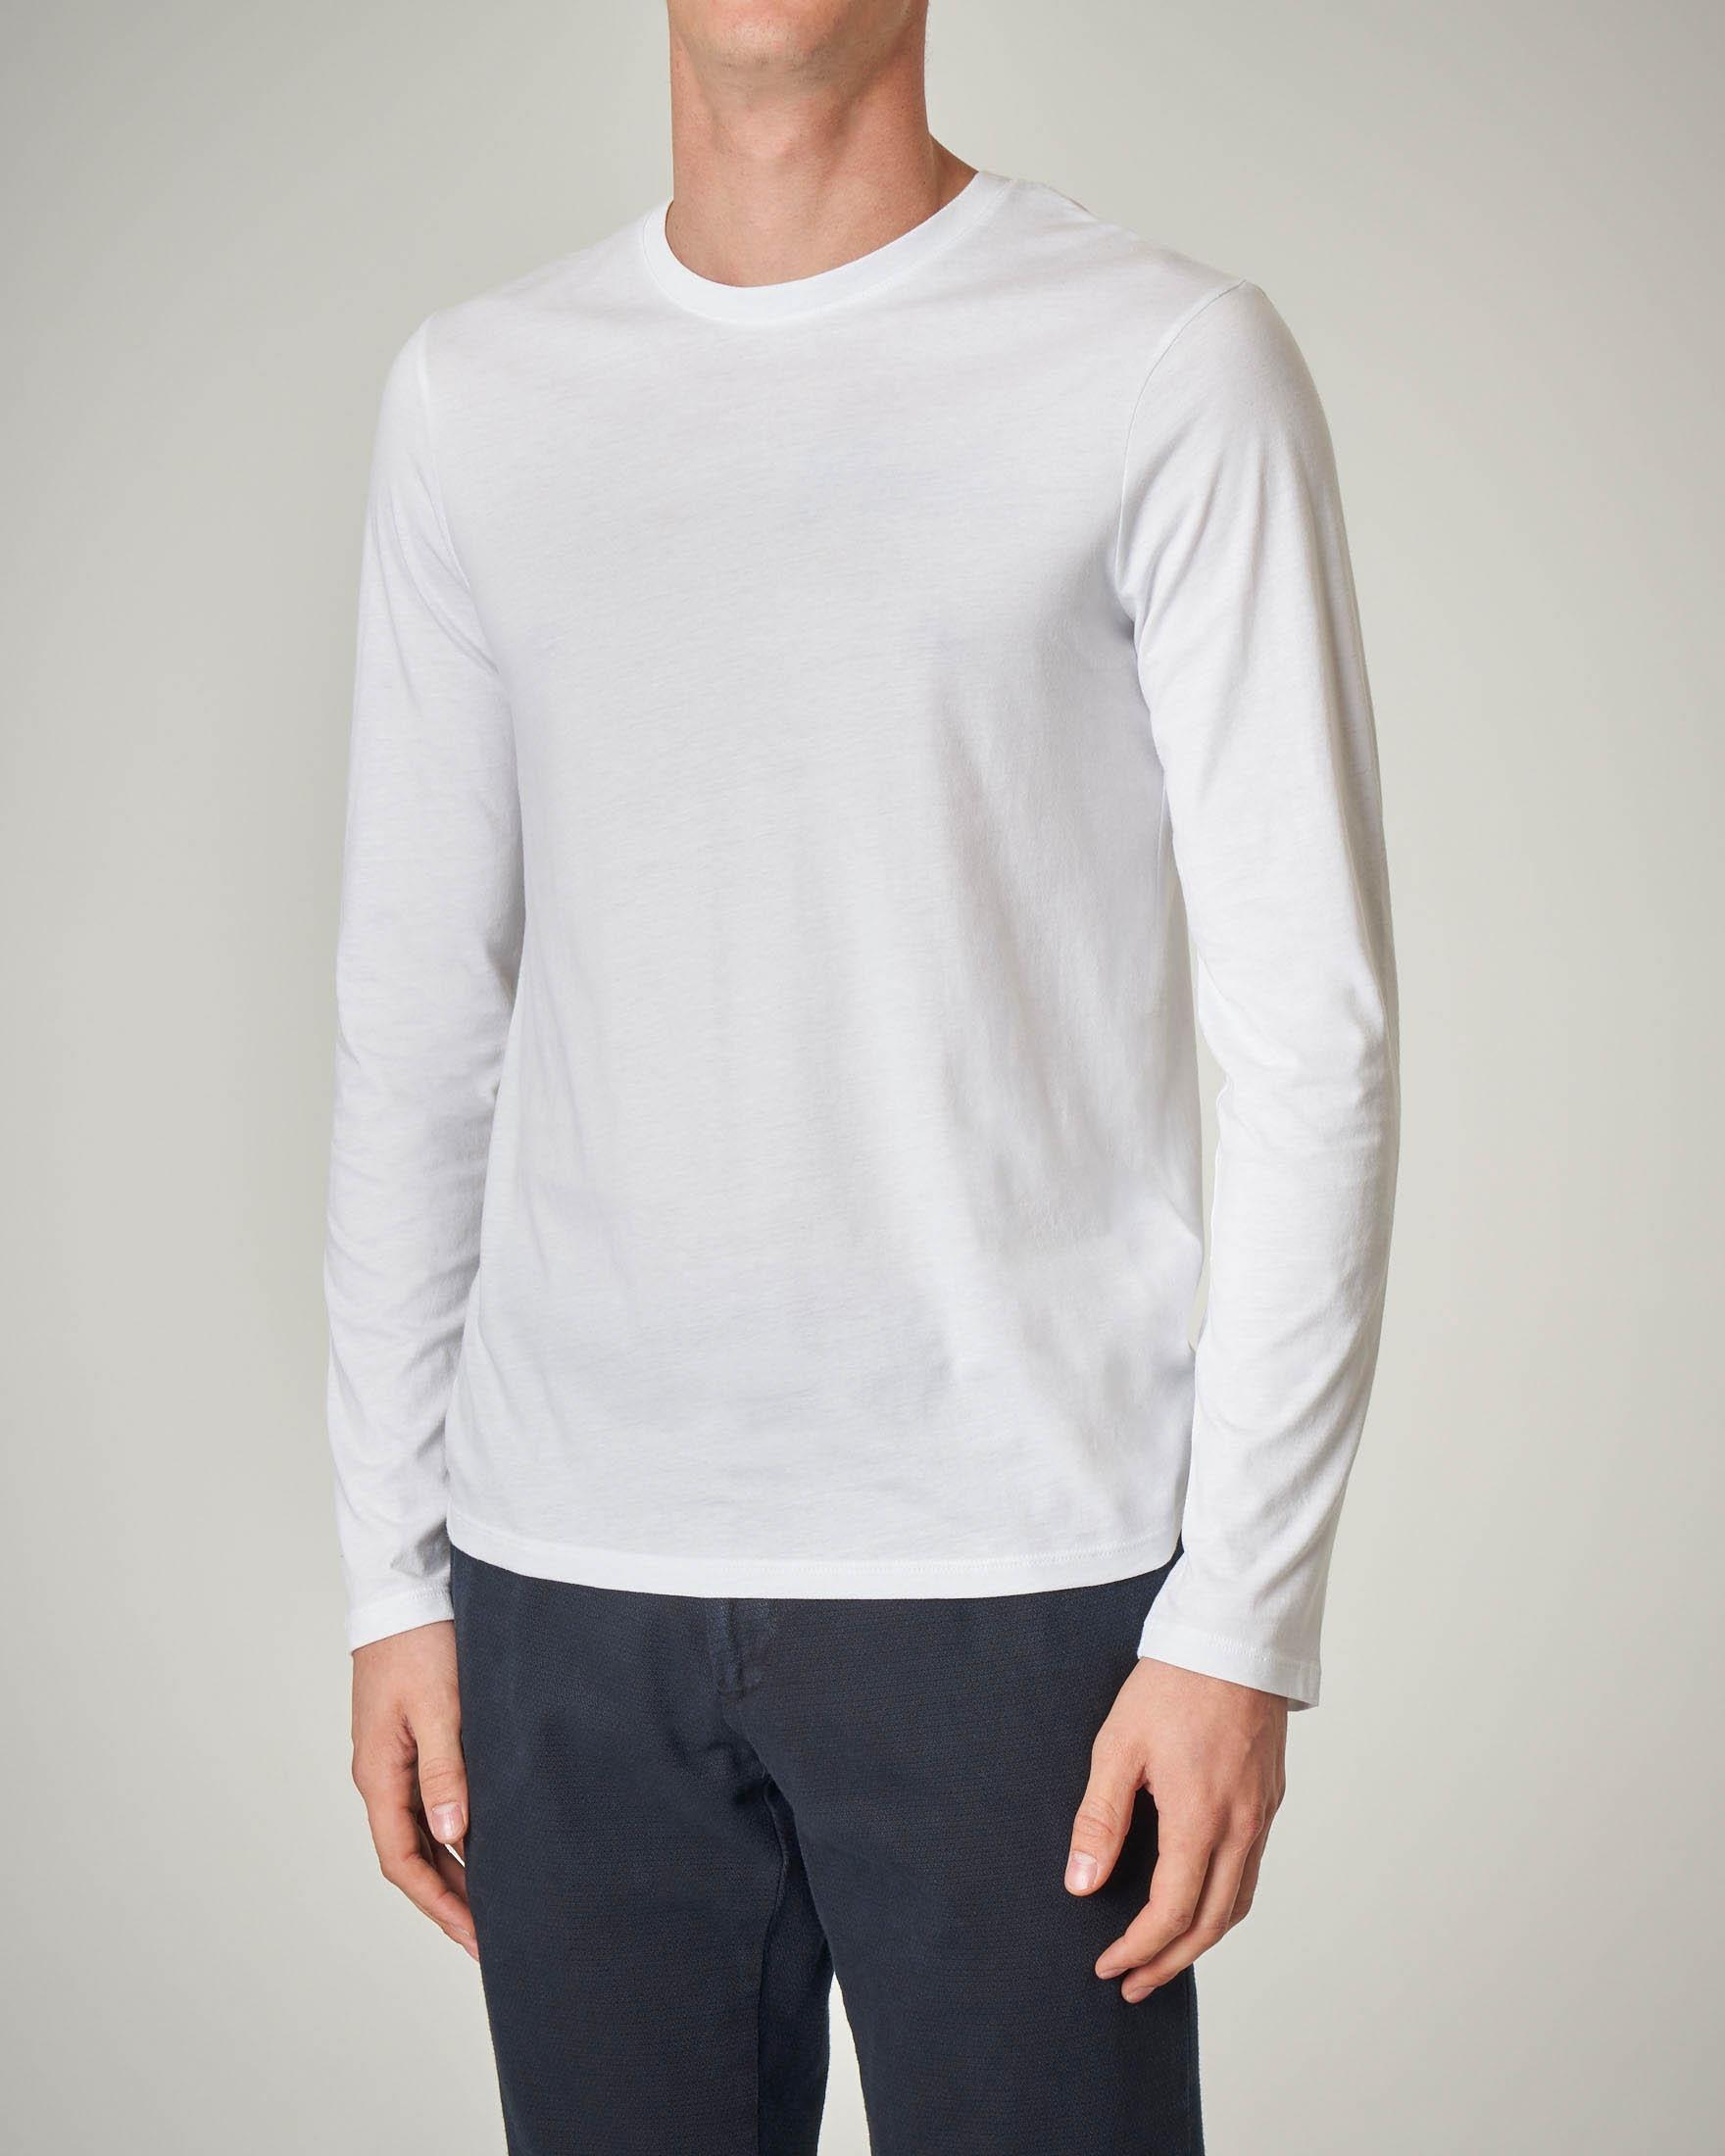 T-shirt bianca manica lunga basica